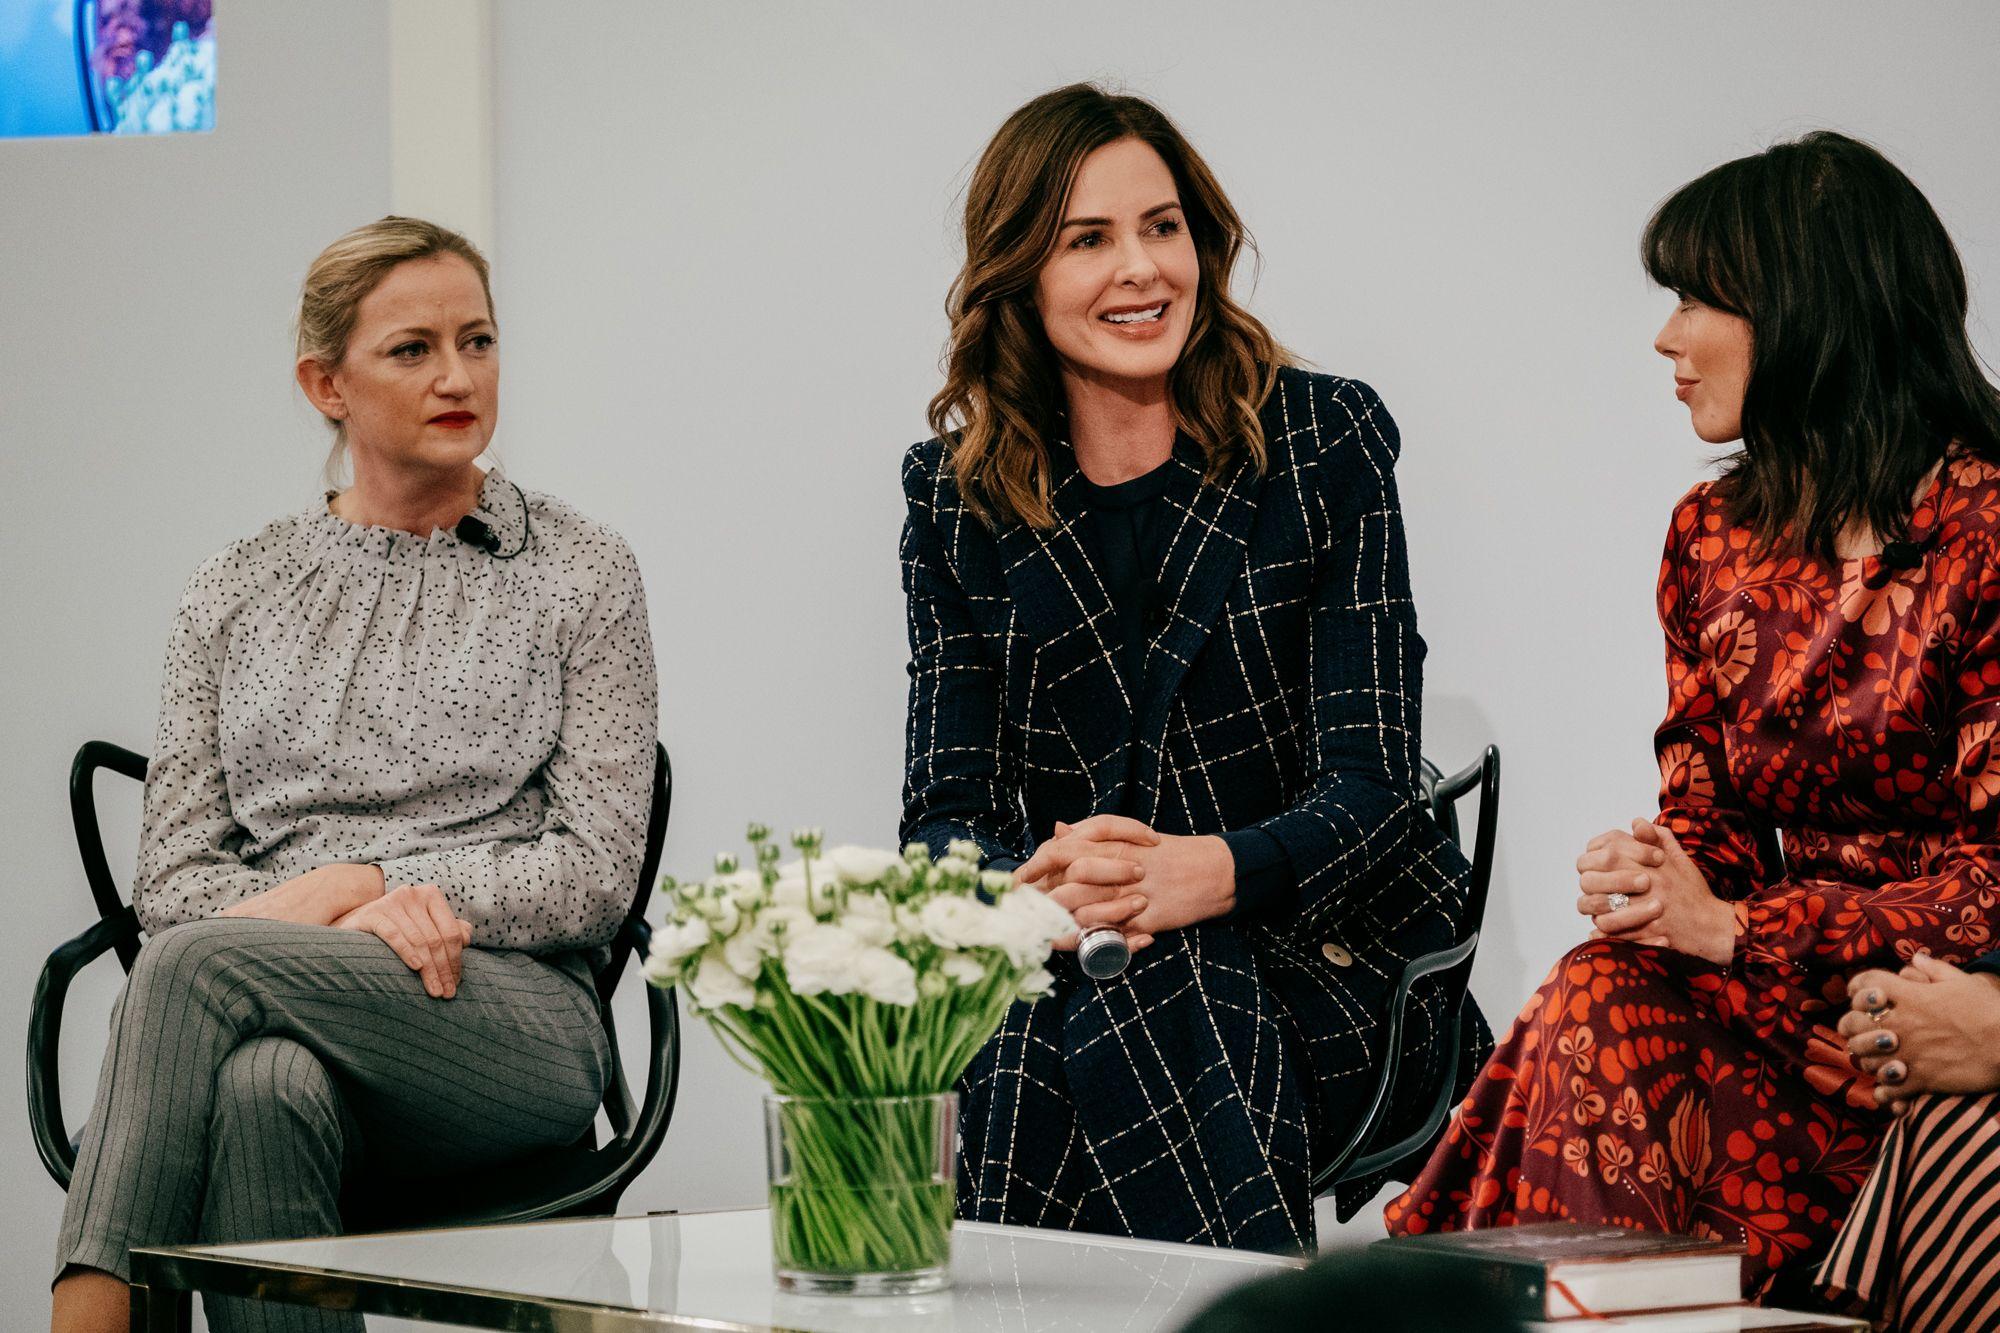 Inside the 2019 Bazaar Summit